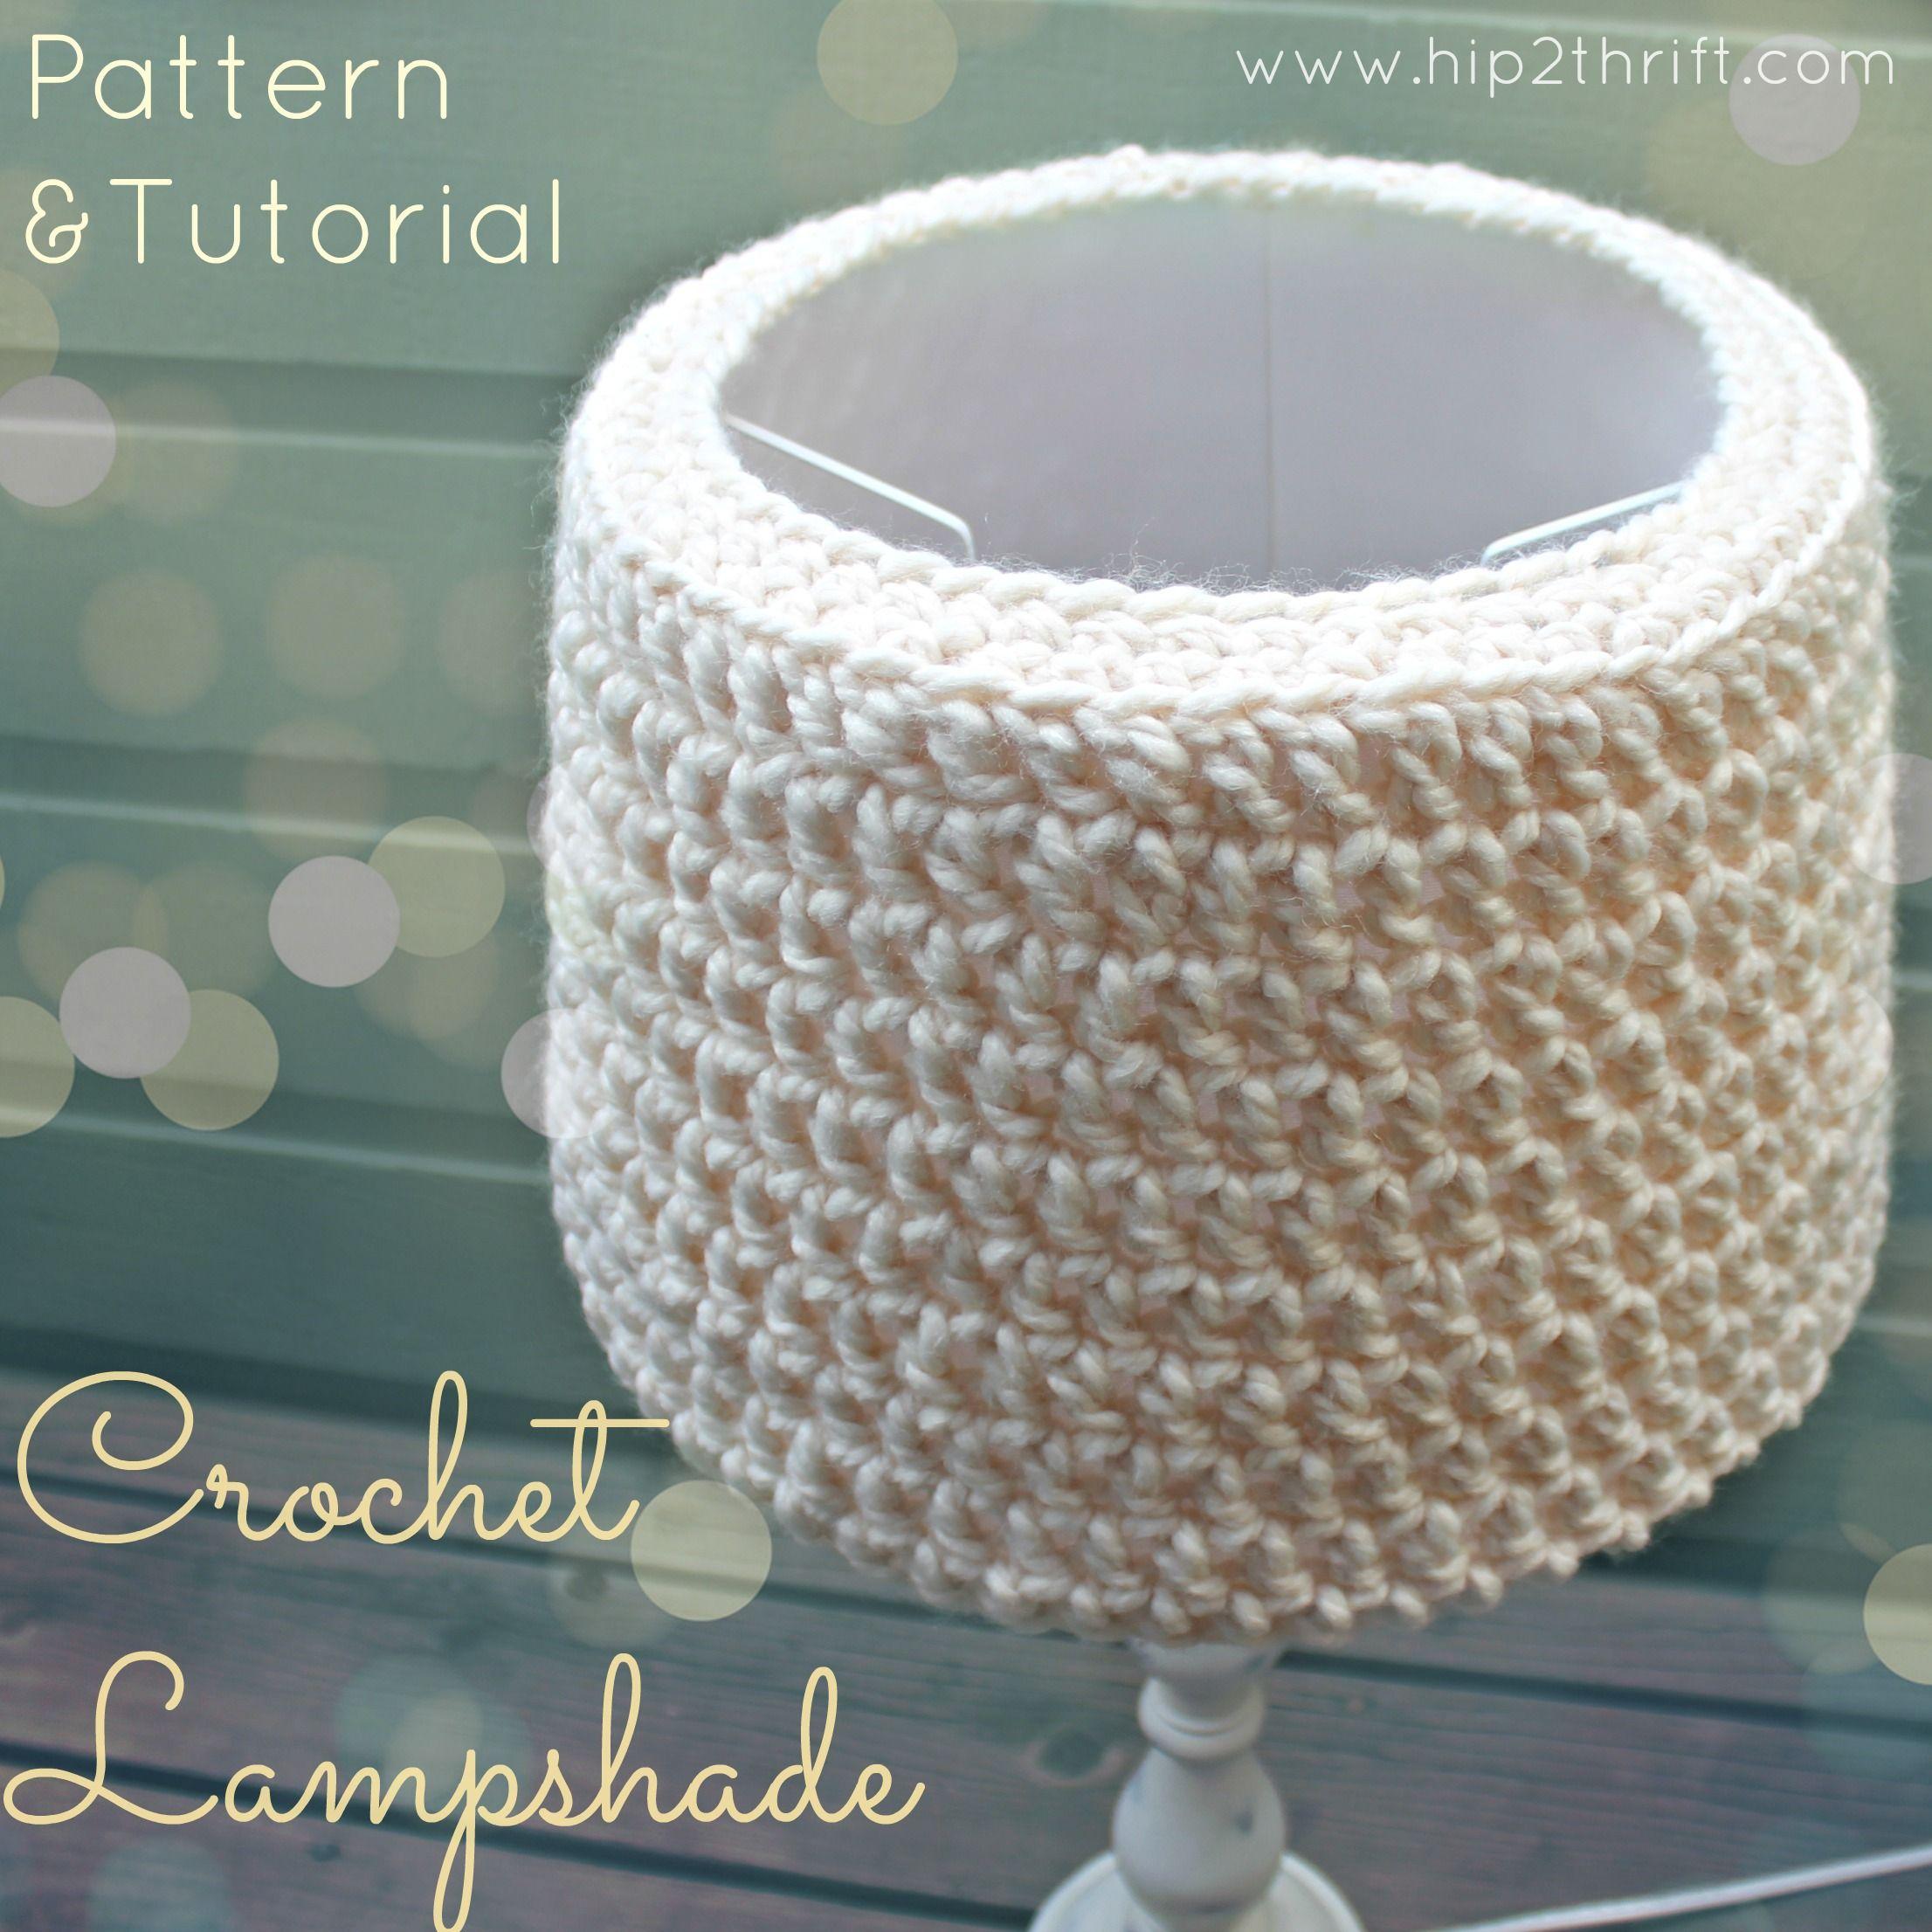 Crochet Pattern Lovely Lampshade : Crochet Lampshade Pattern Free Crochet Patterns ...